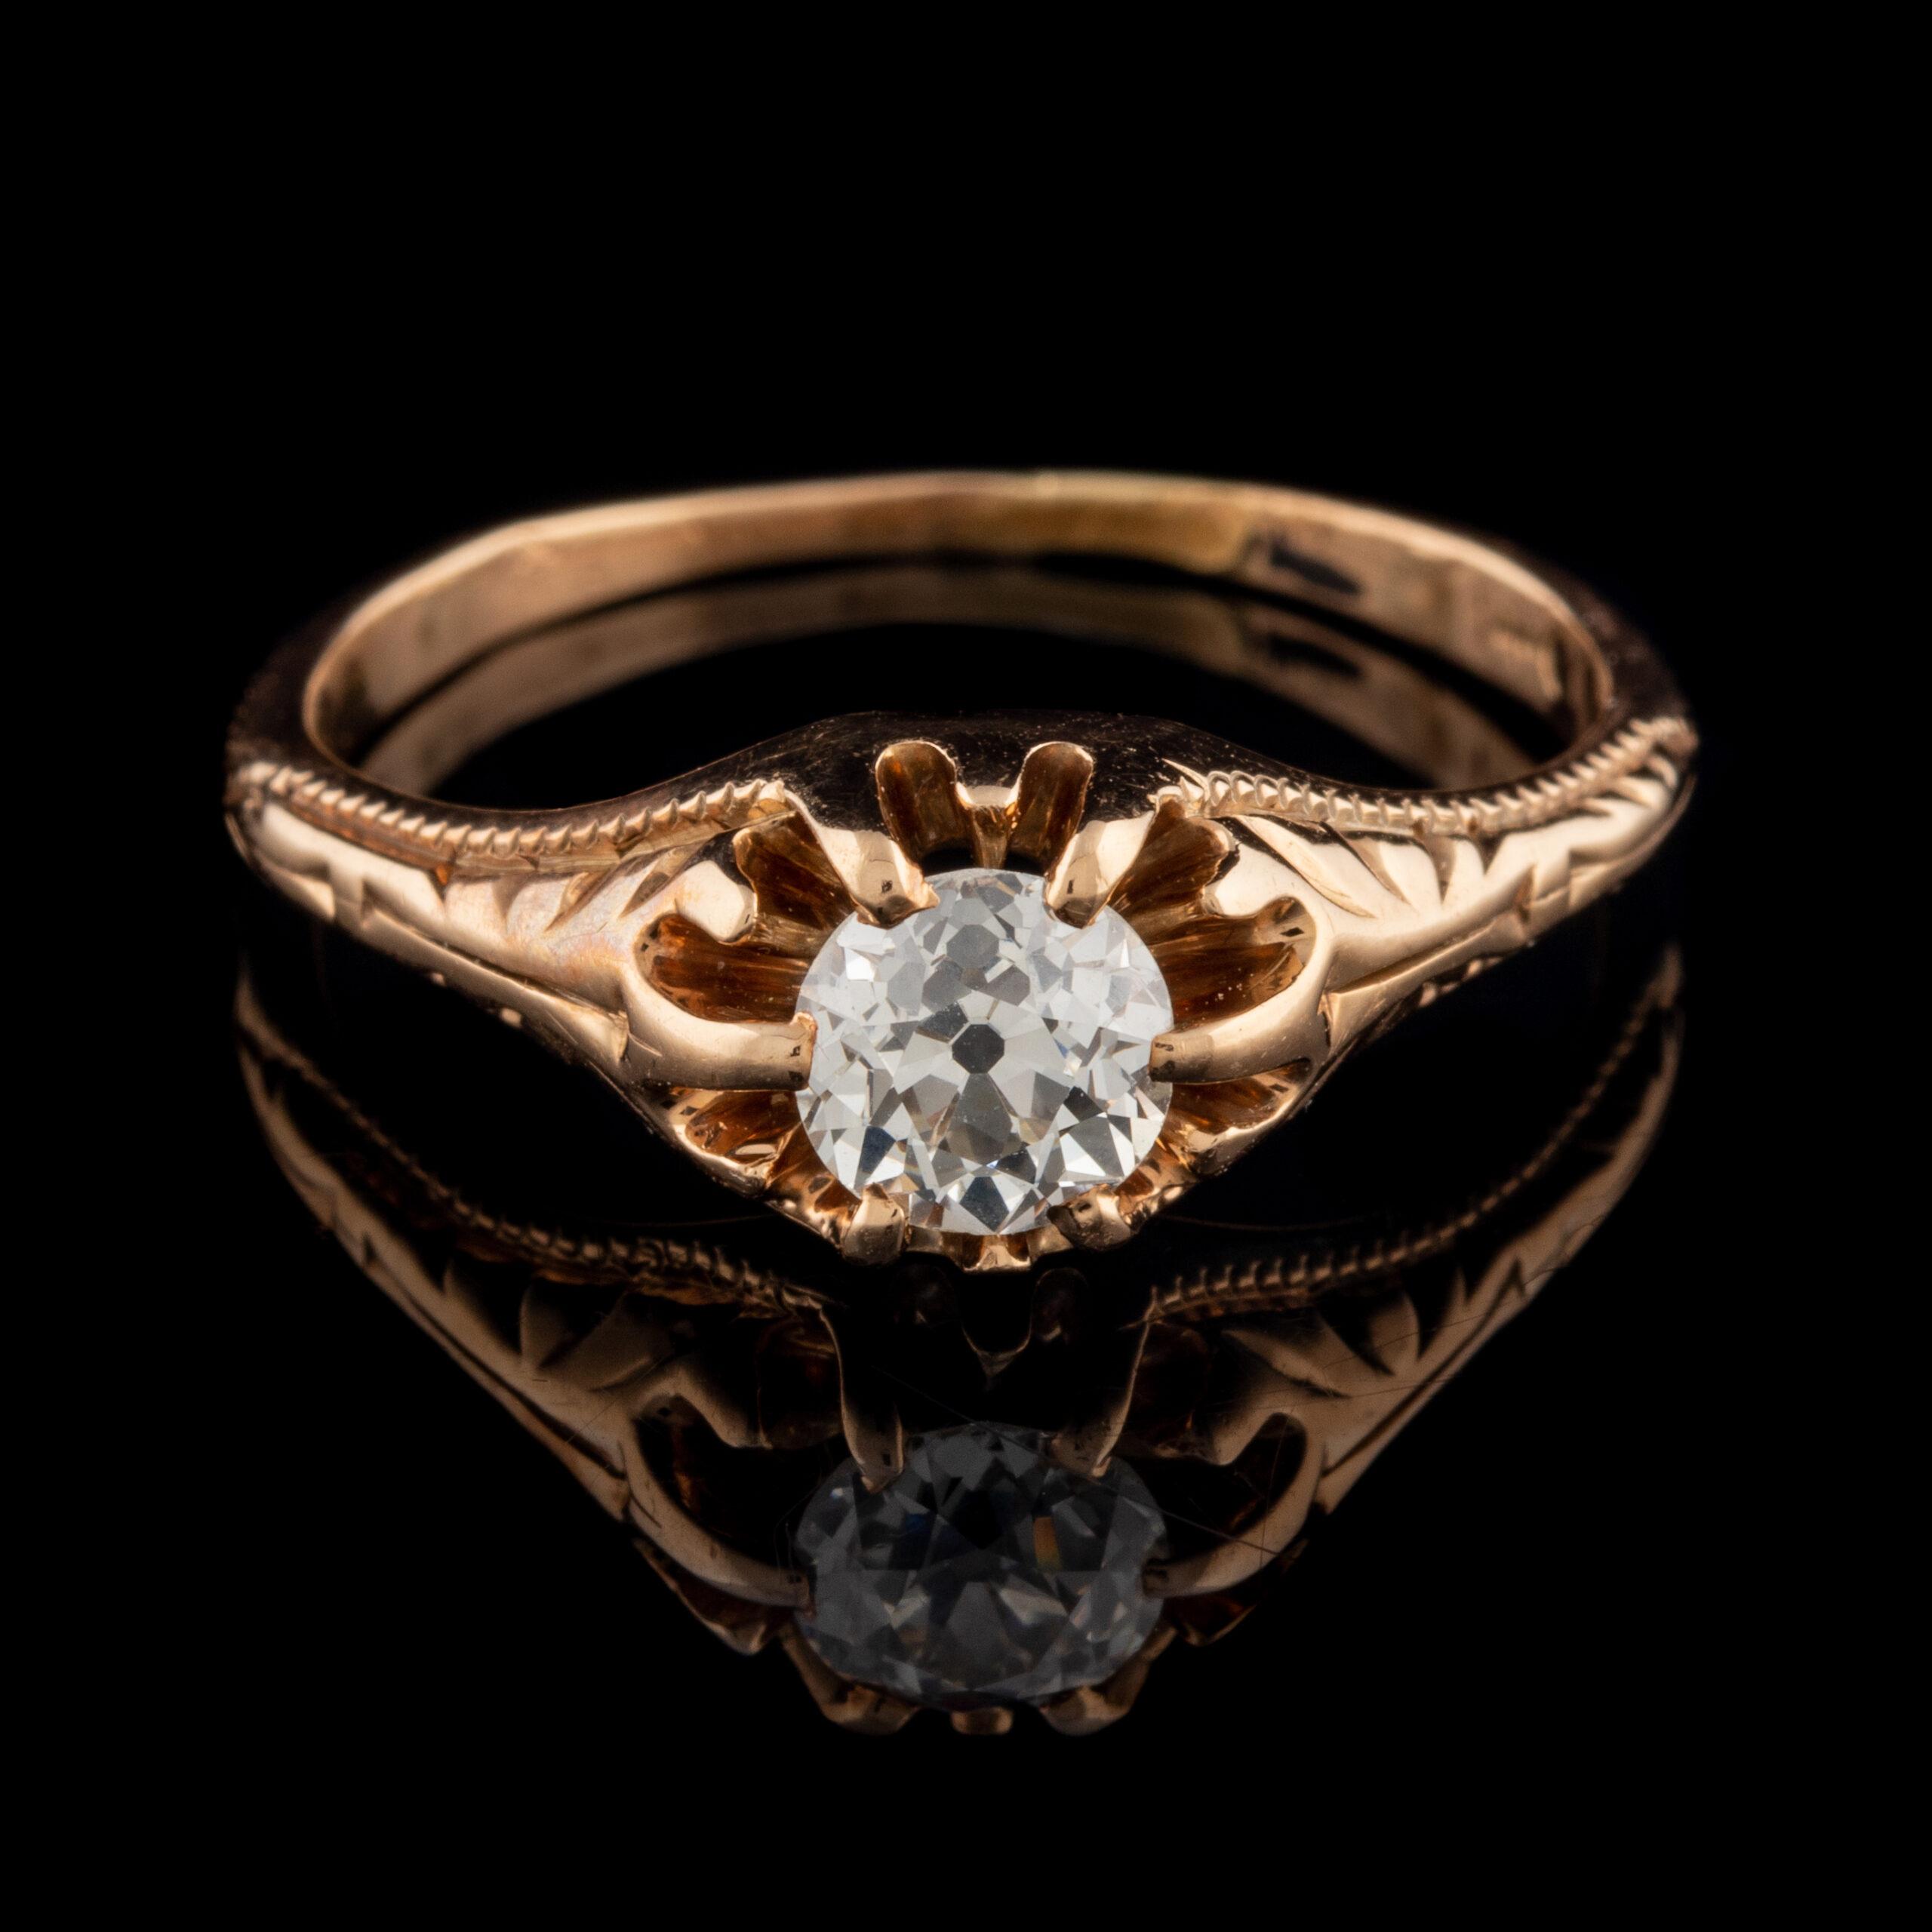 Antique 14K Old European Cut VVS Diamond Ring